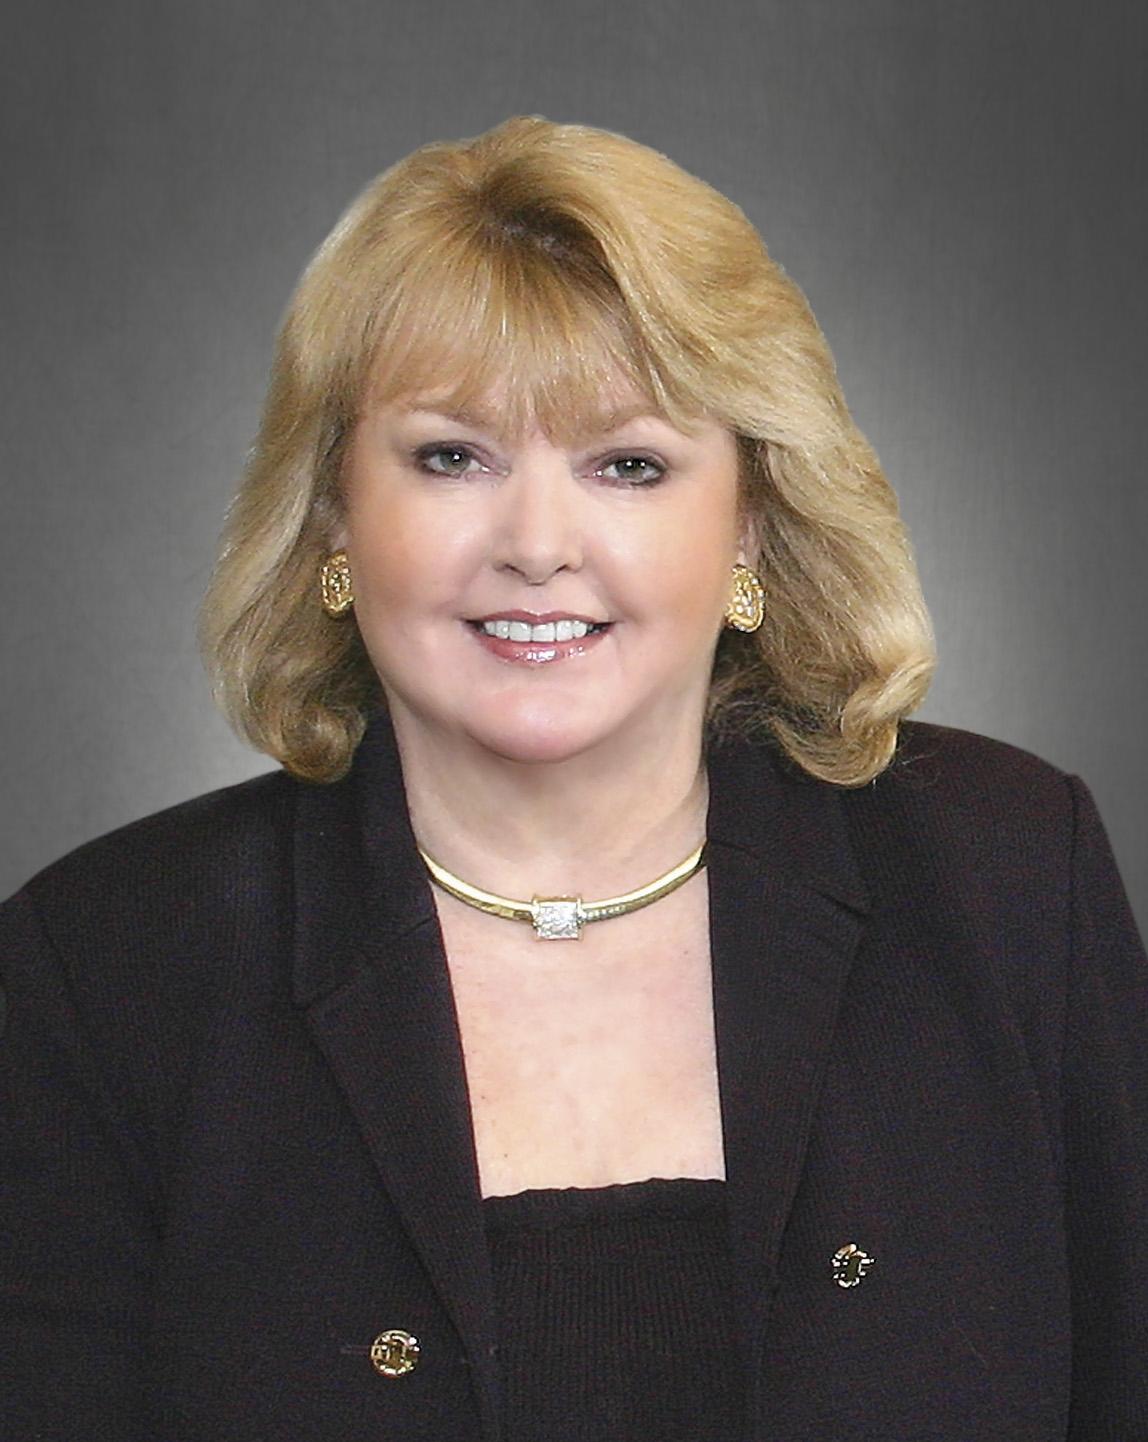 Teresa King Kinney, chief executive officer of the Miami Association of Realtors.